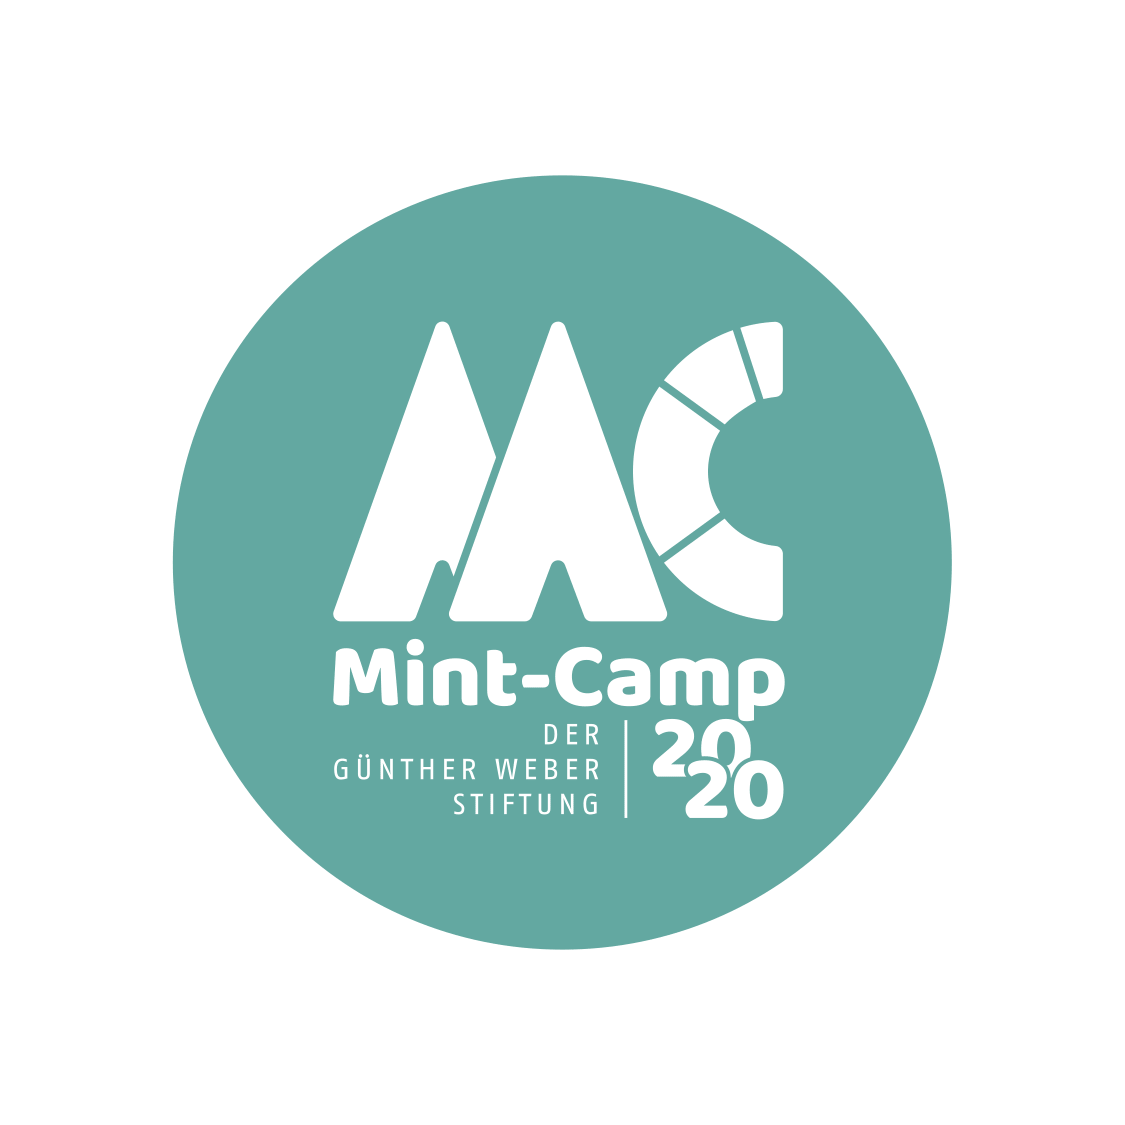 02 logo mint camp 2020 ngeativ 1125px